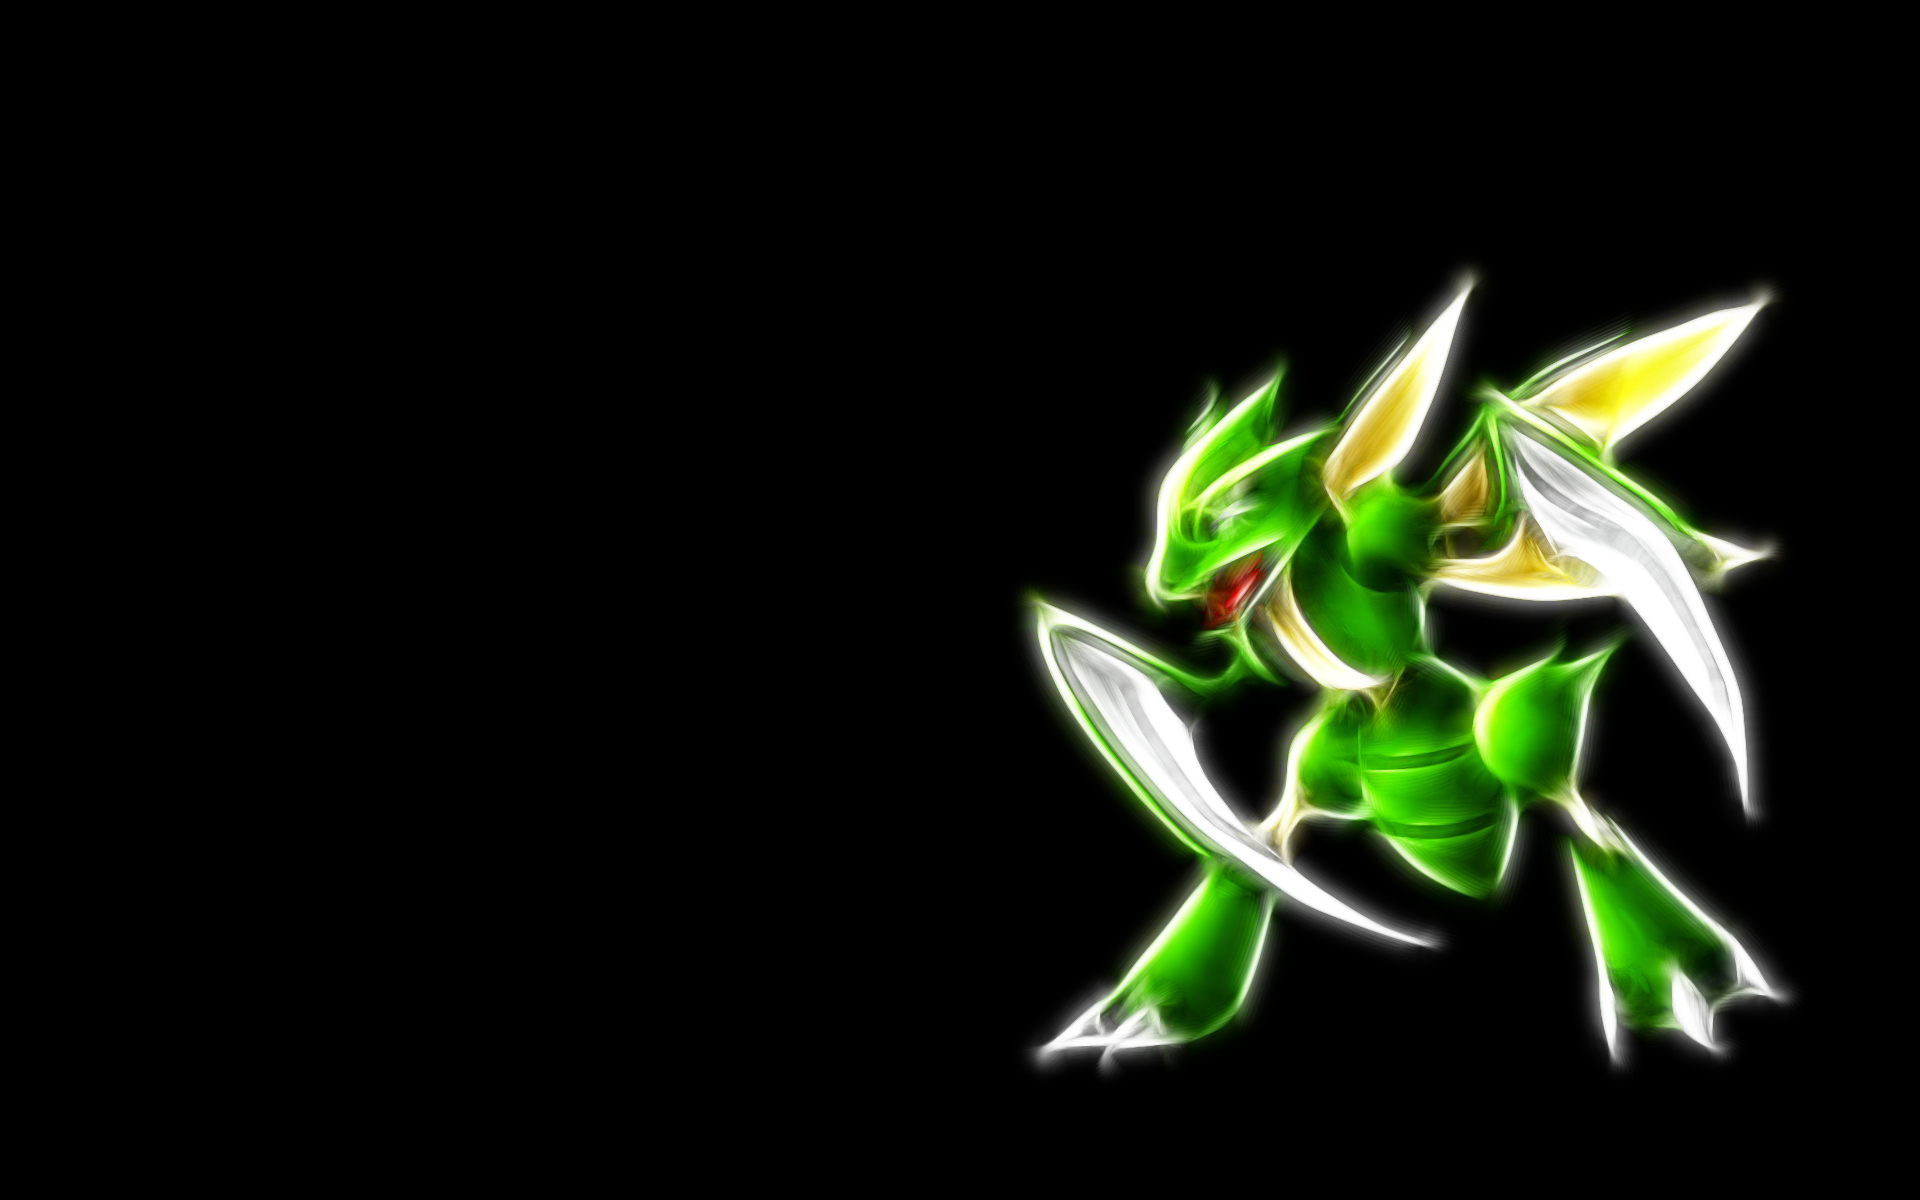 Pokemon Hd Wallpaper Background Image 1920x1200 Id